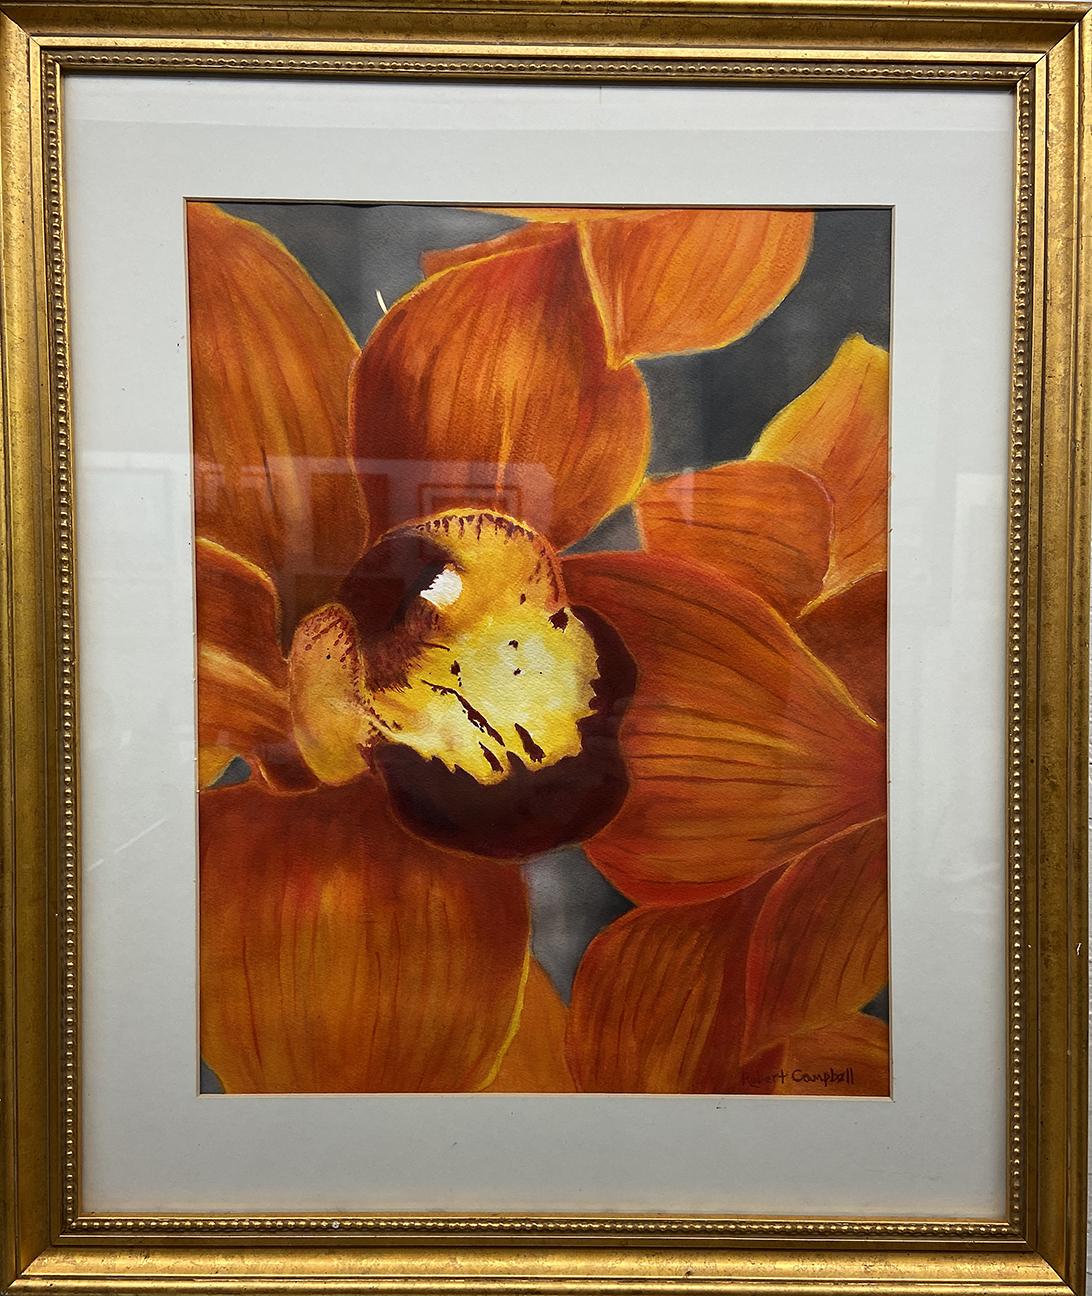 #1 Orange Splash, Rob Campbell,  Watercolor (22 x 18), $50.00 suggested minimum bid  (156 meals)